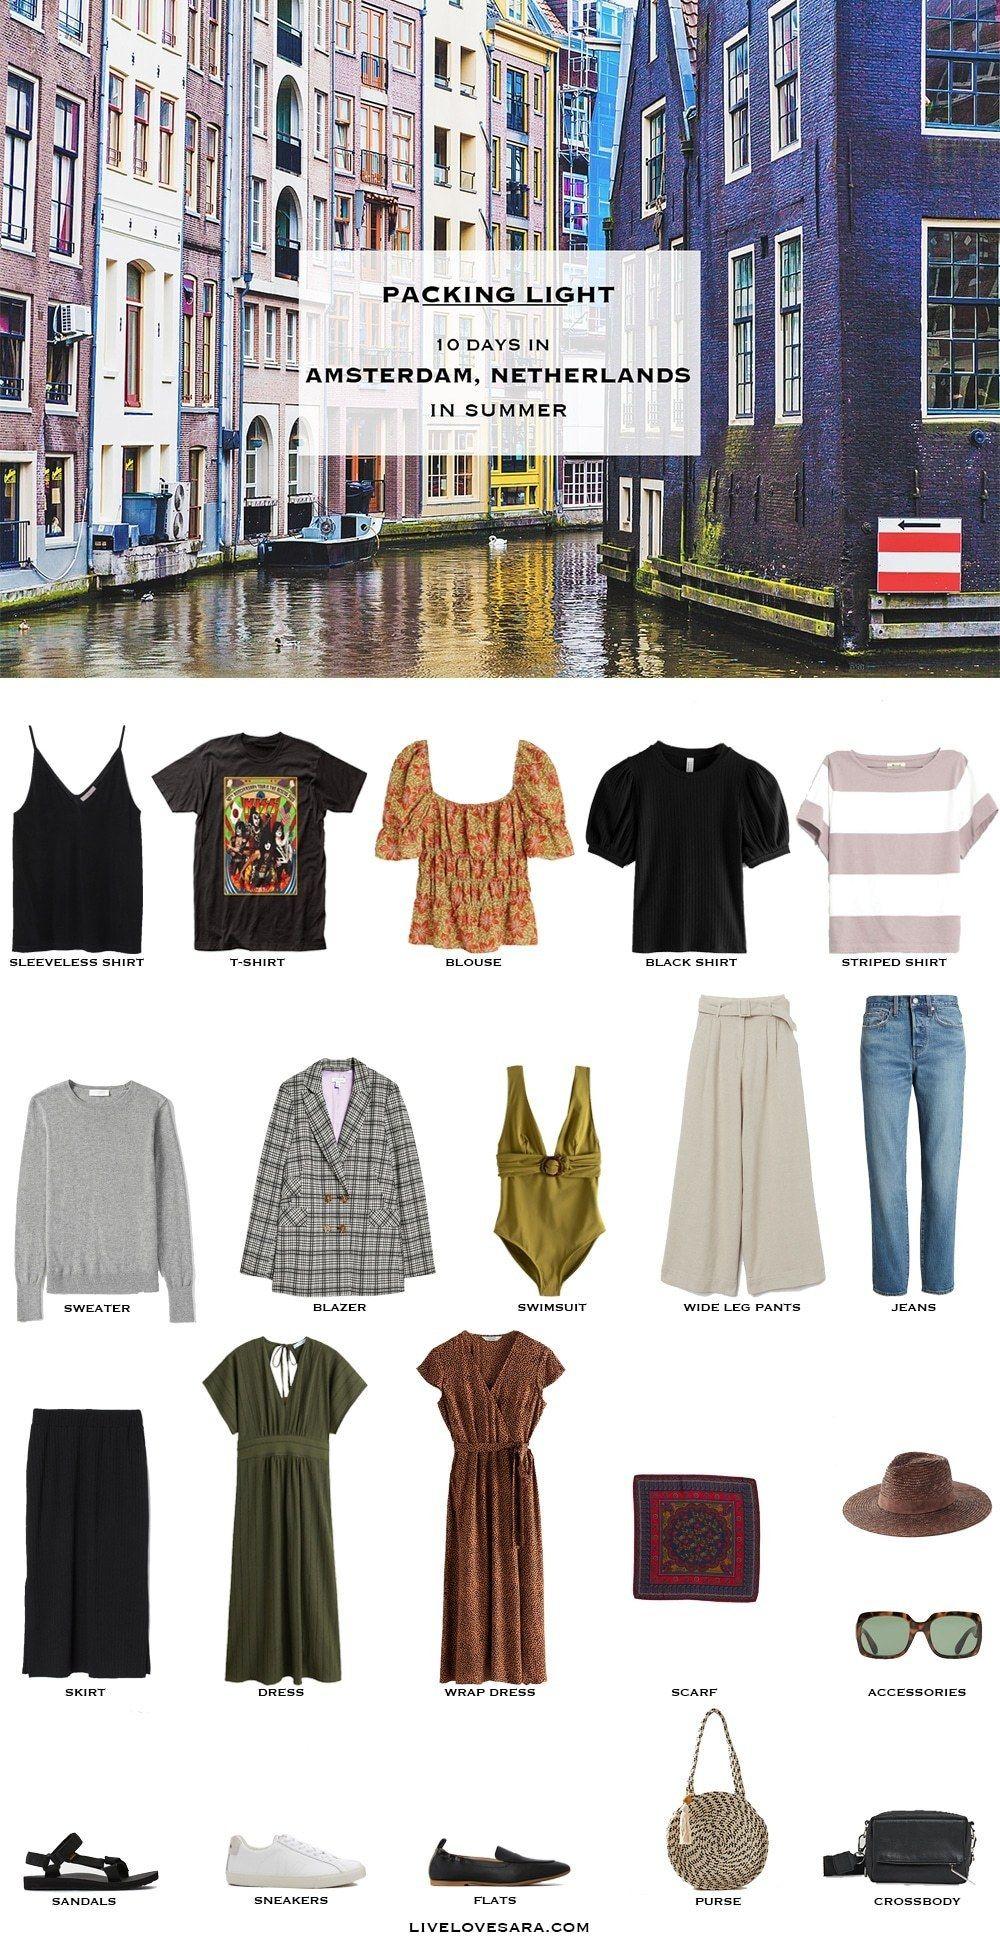 What to Pack for Amsterdam Netherlands in Summer #travelwardrobesummer